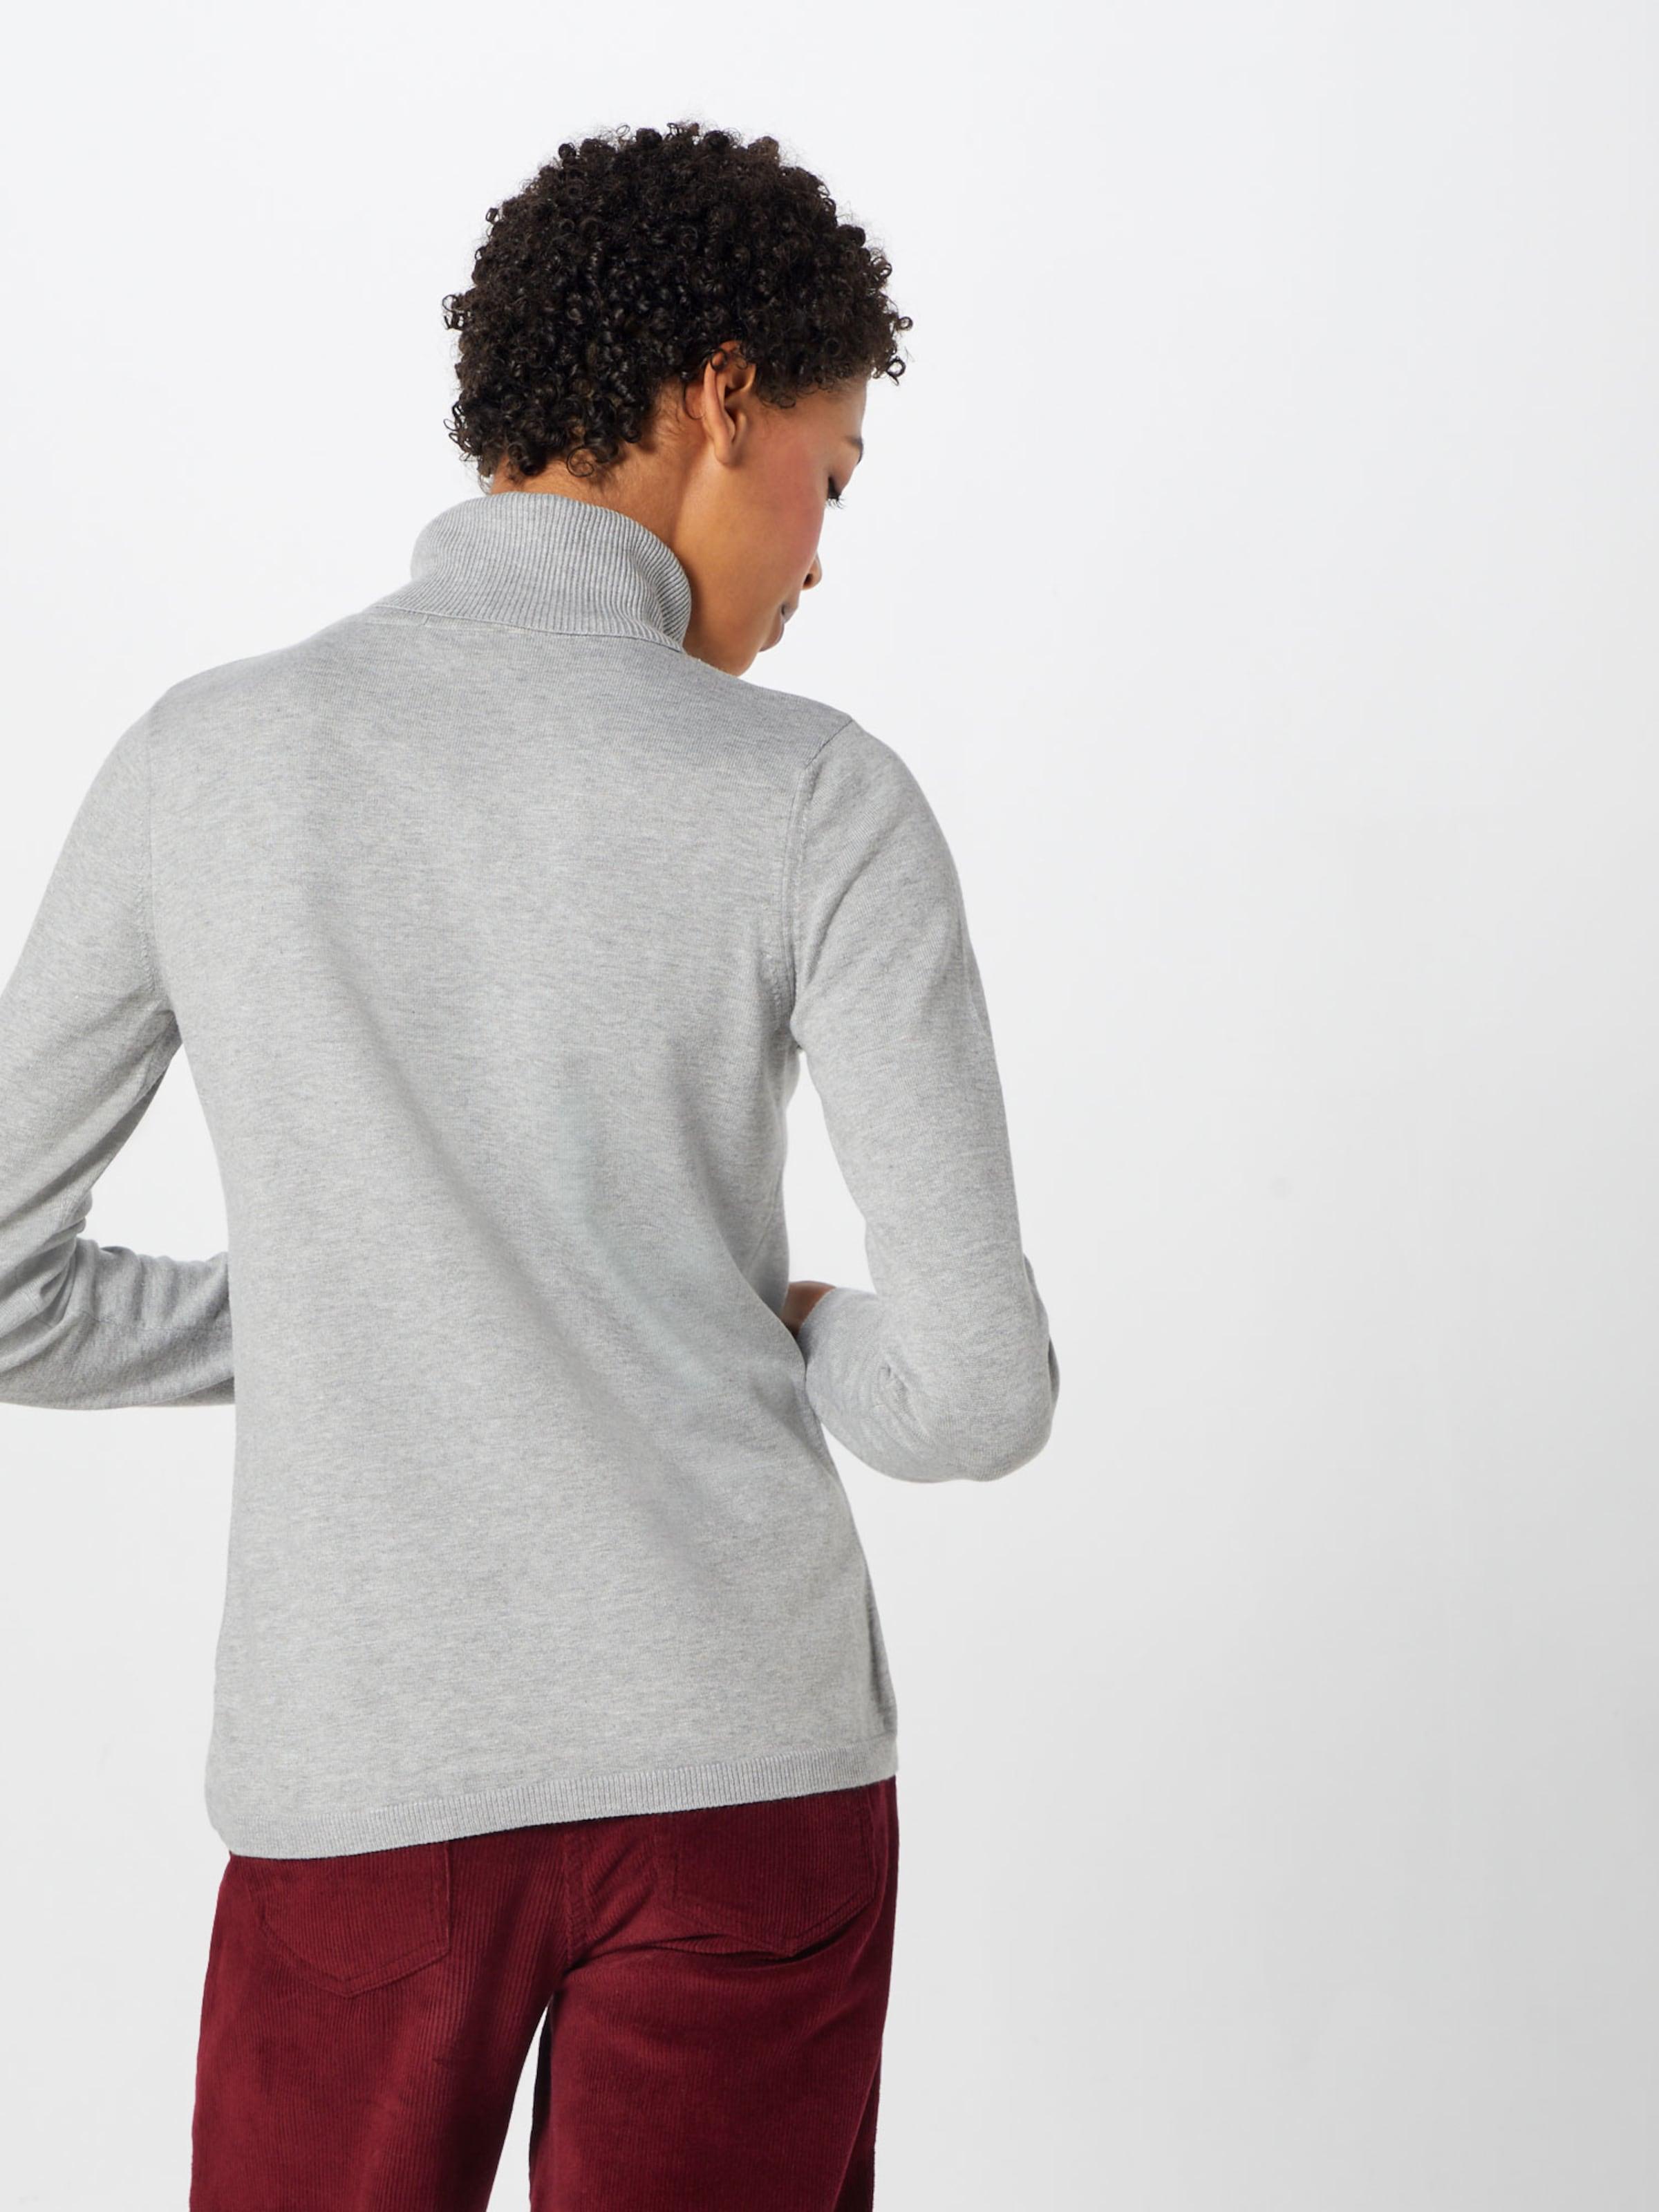 Pullover Pullover In Graumeliert Graumeliert Moreamp; In Moreamp; Aj5c34LqSR